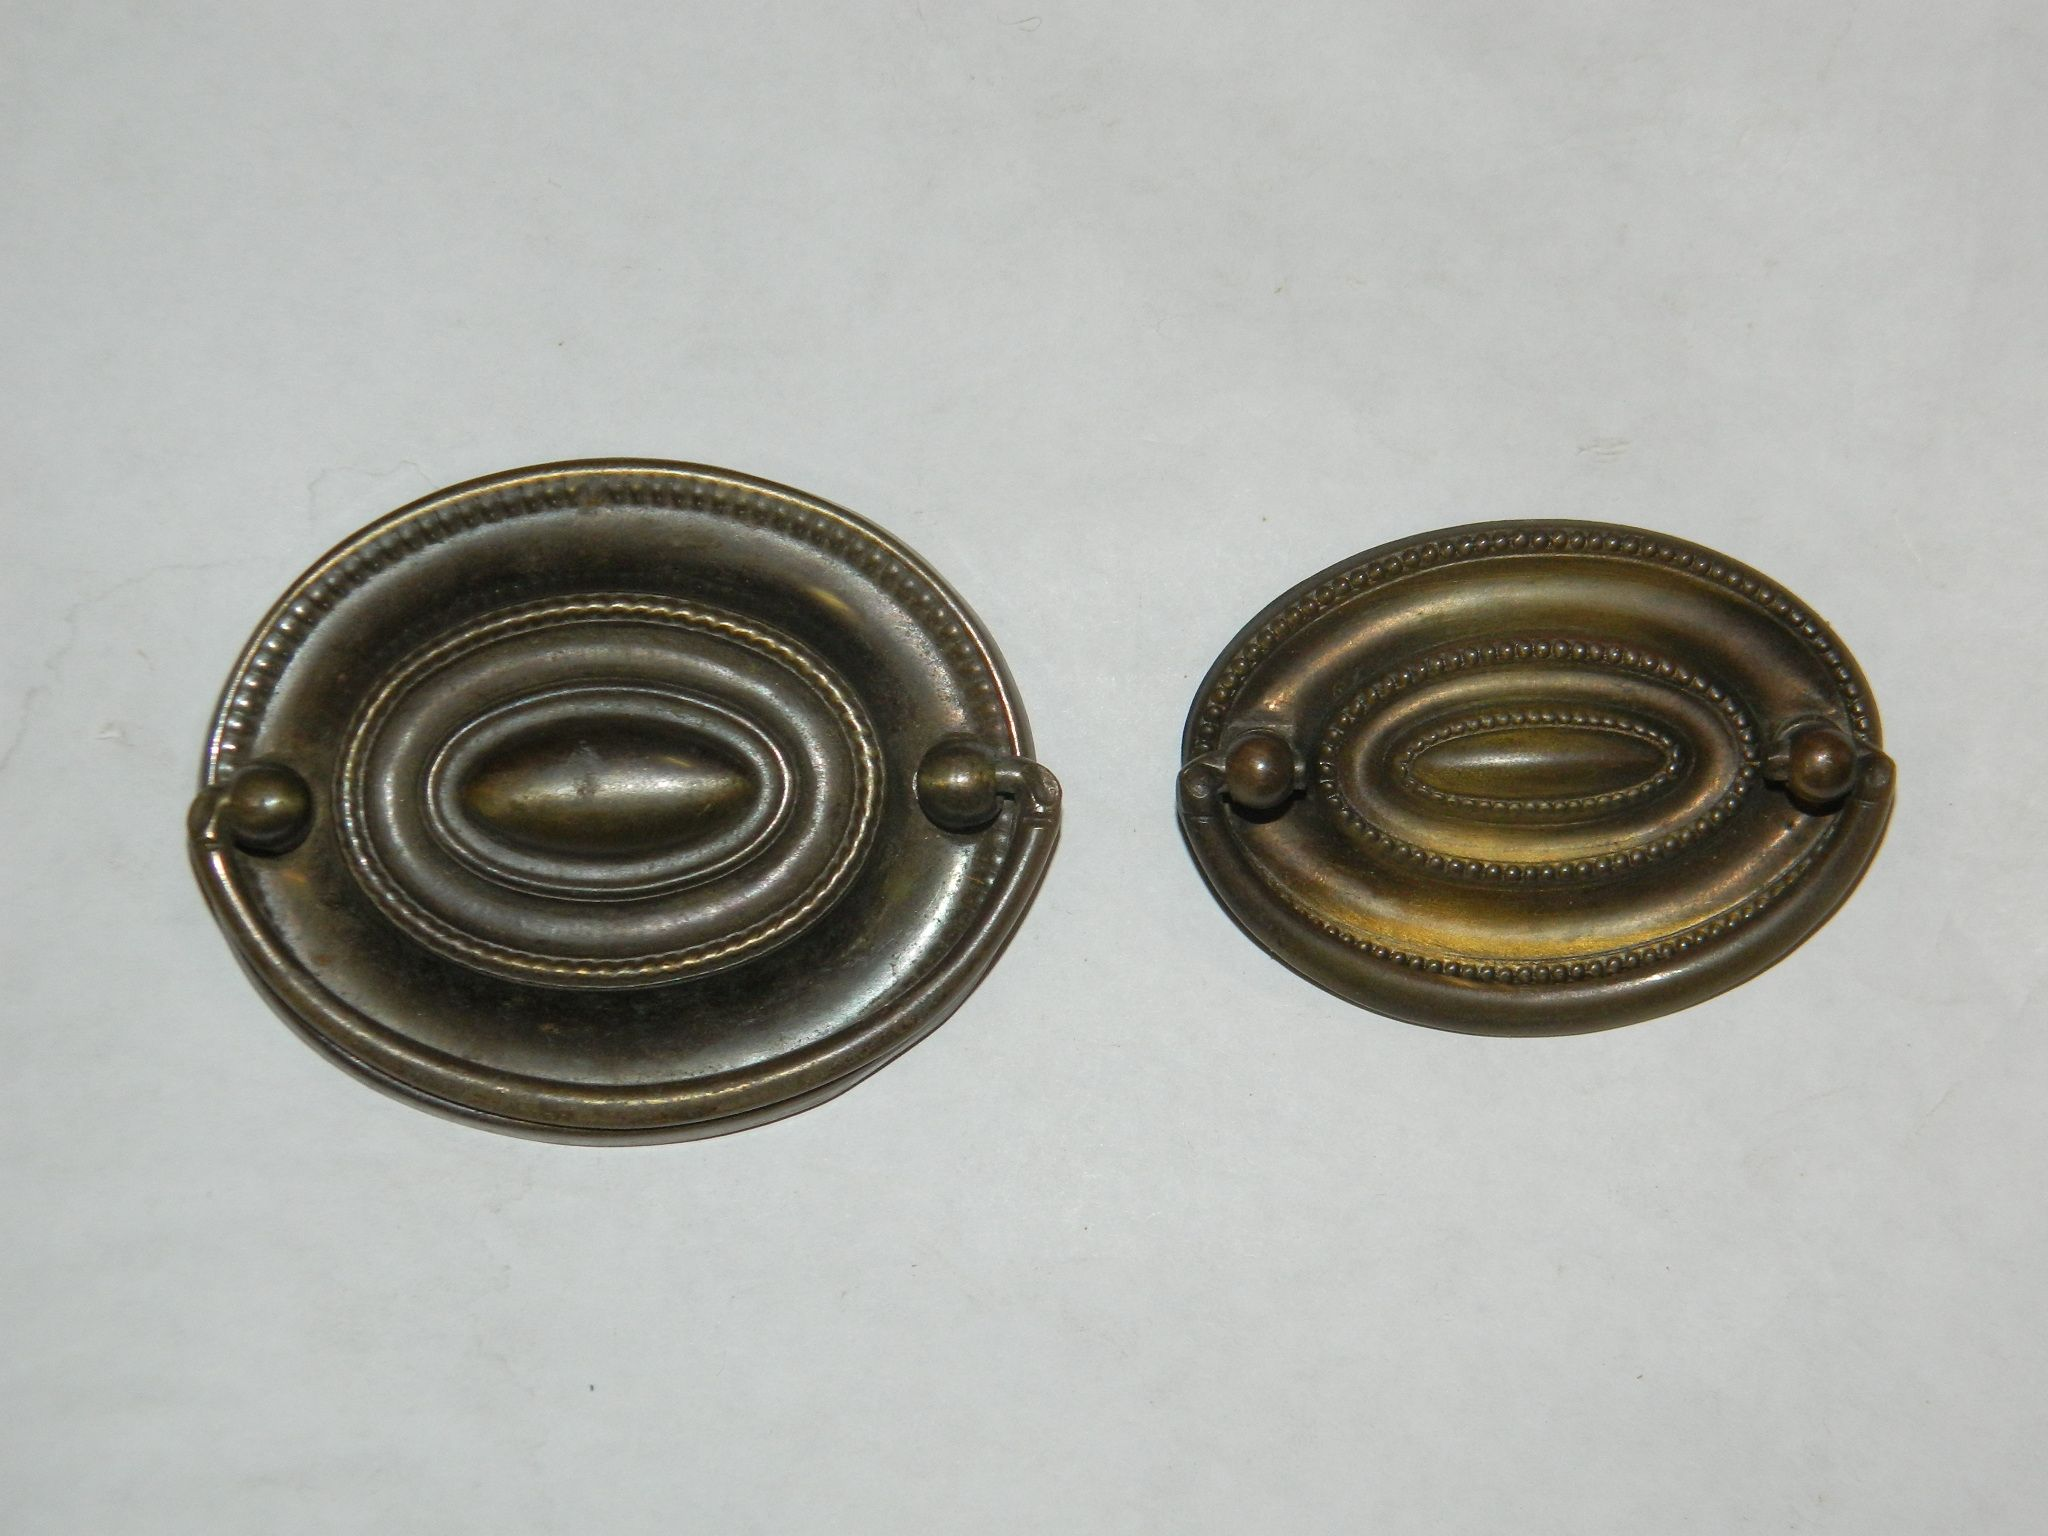 antique hardware old original period drawer pulls handles parts